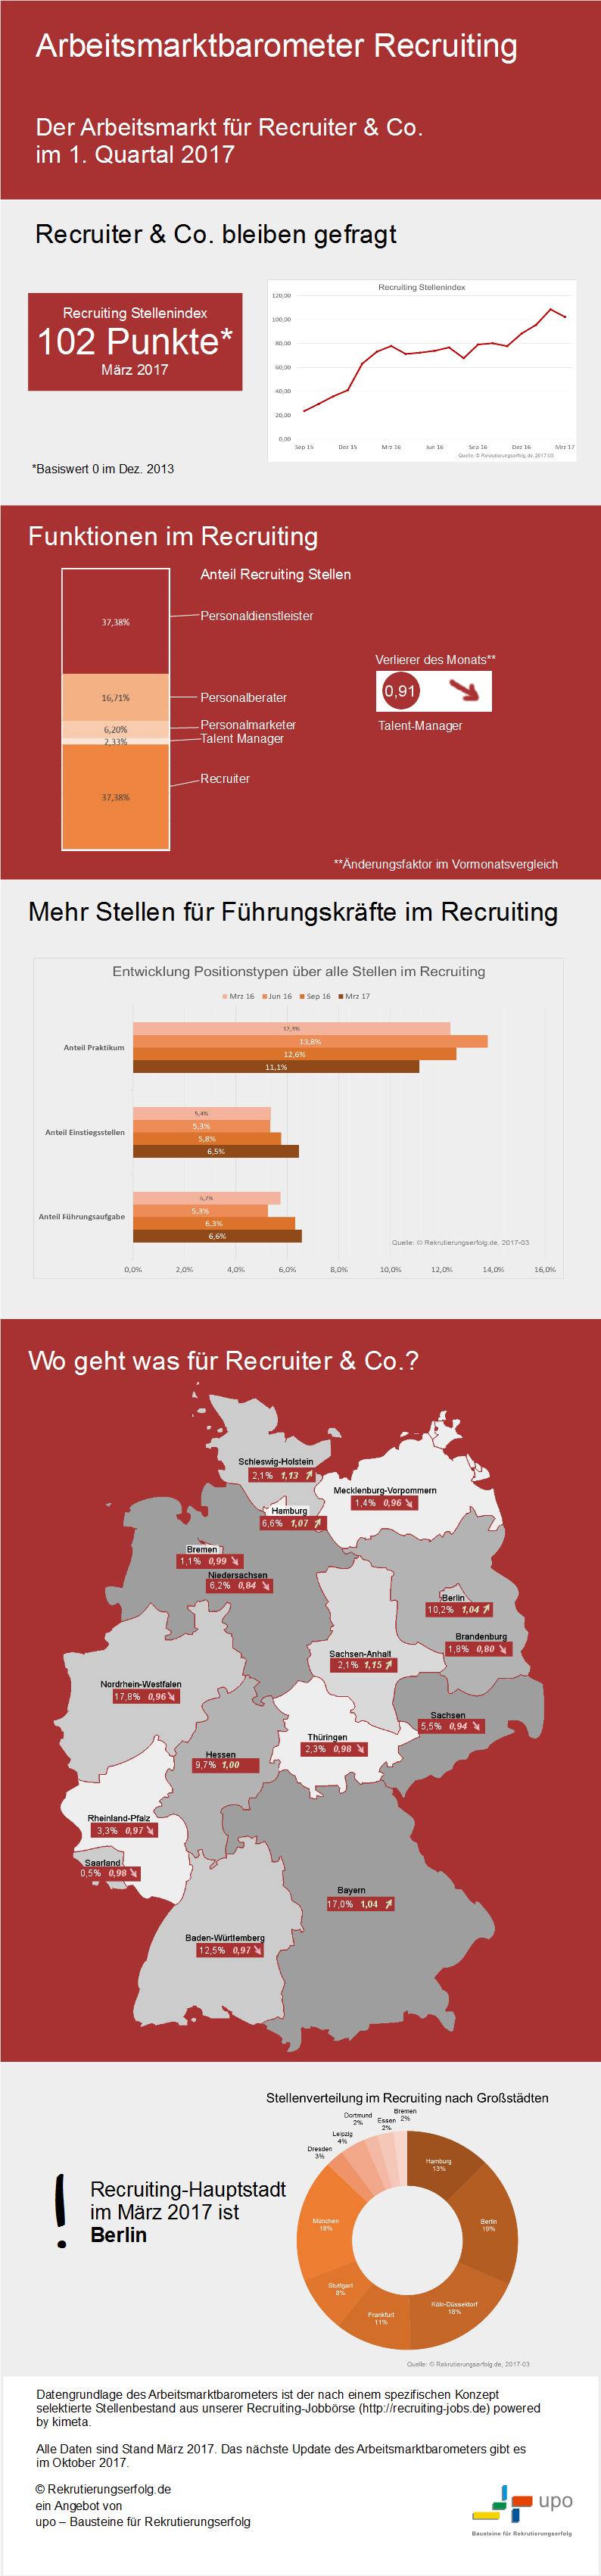 Infografik Arbeitsmarktbarometer Recruiting